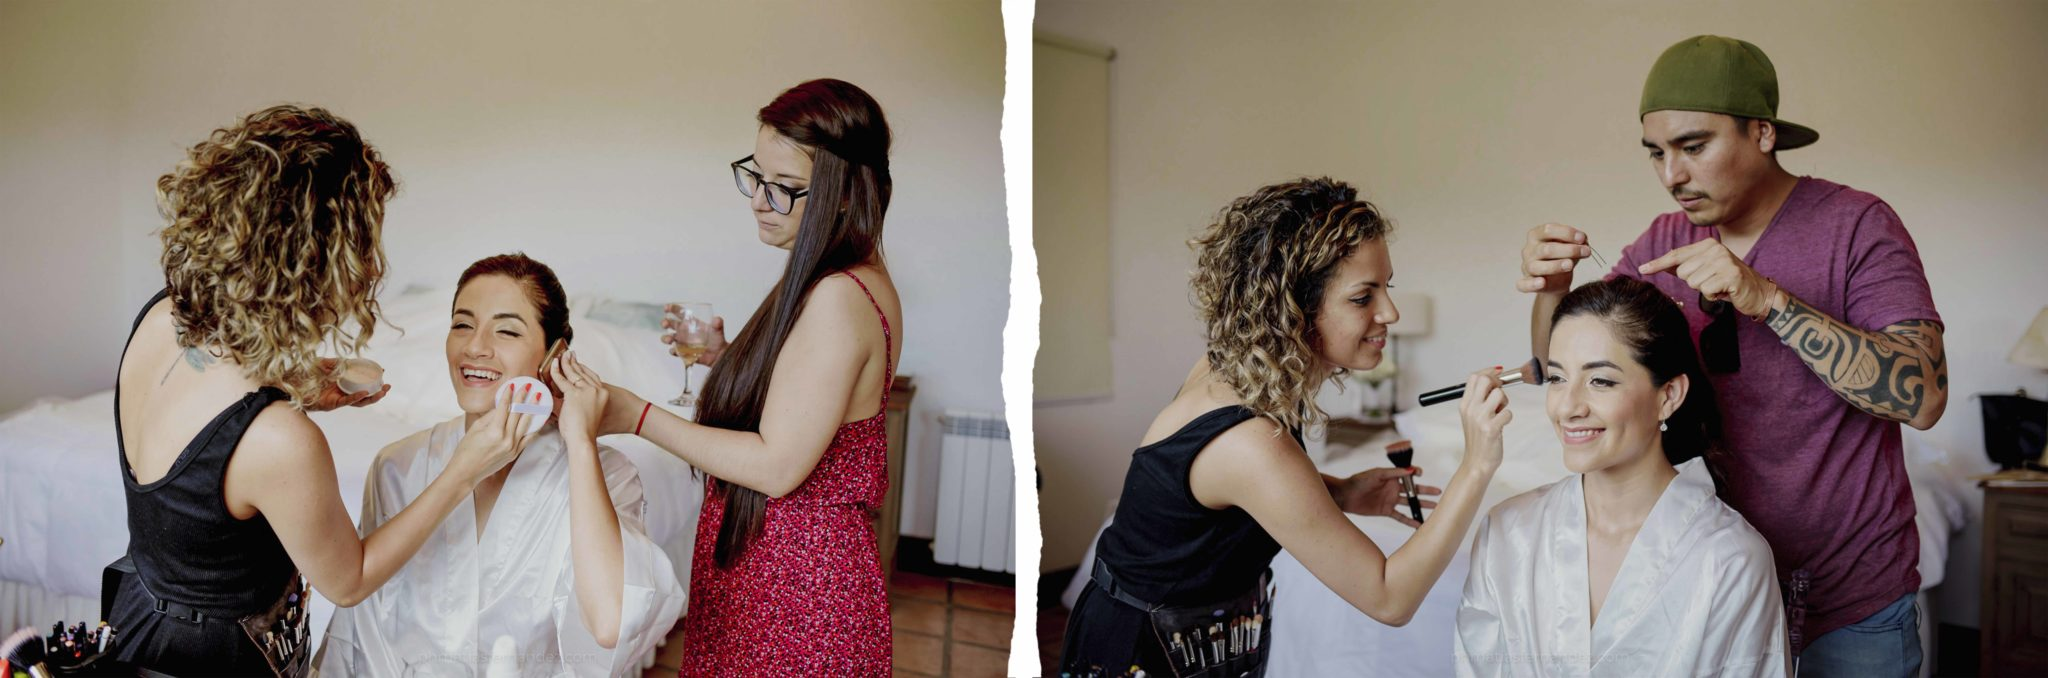 Elena & Martin - phmatiasfernandez - matias fernandez